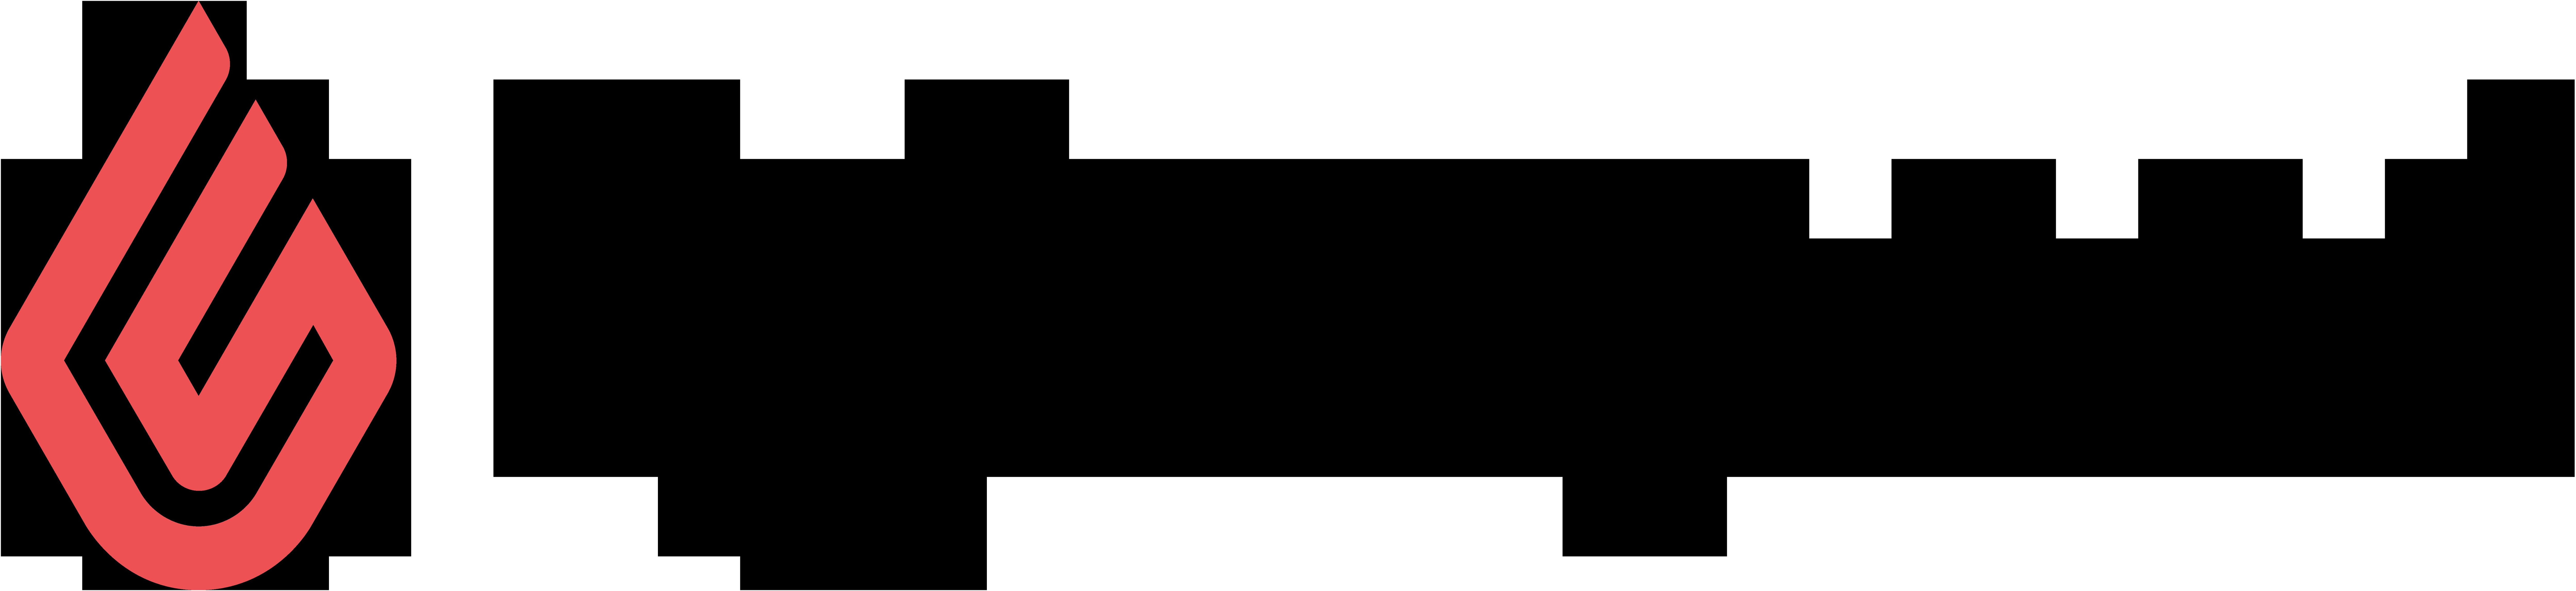 Lightspeed Gastrofix POS